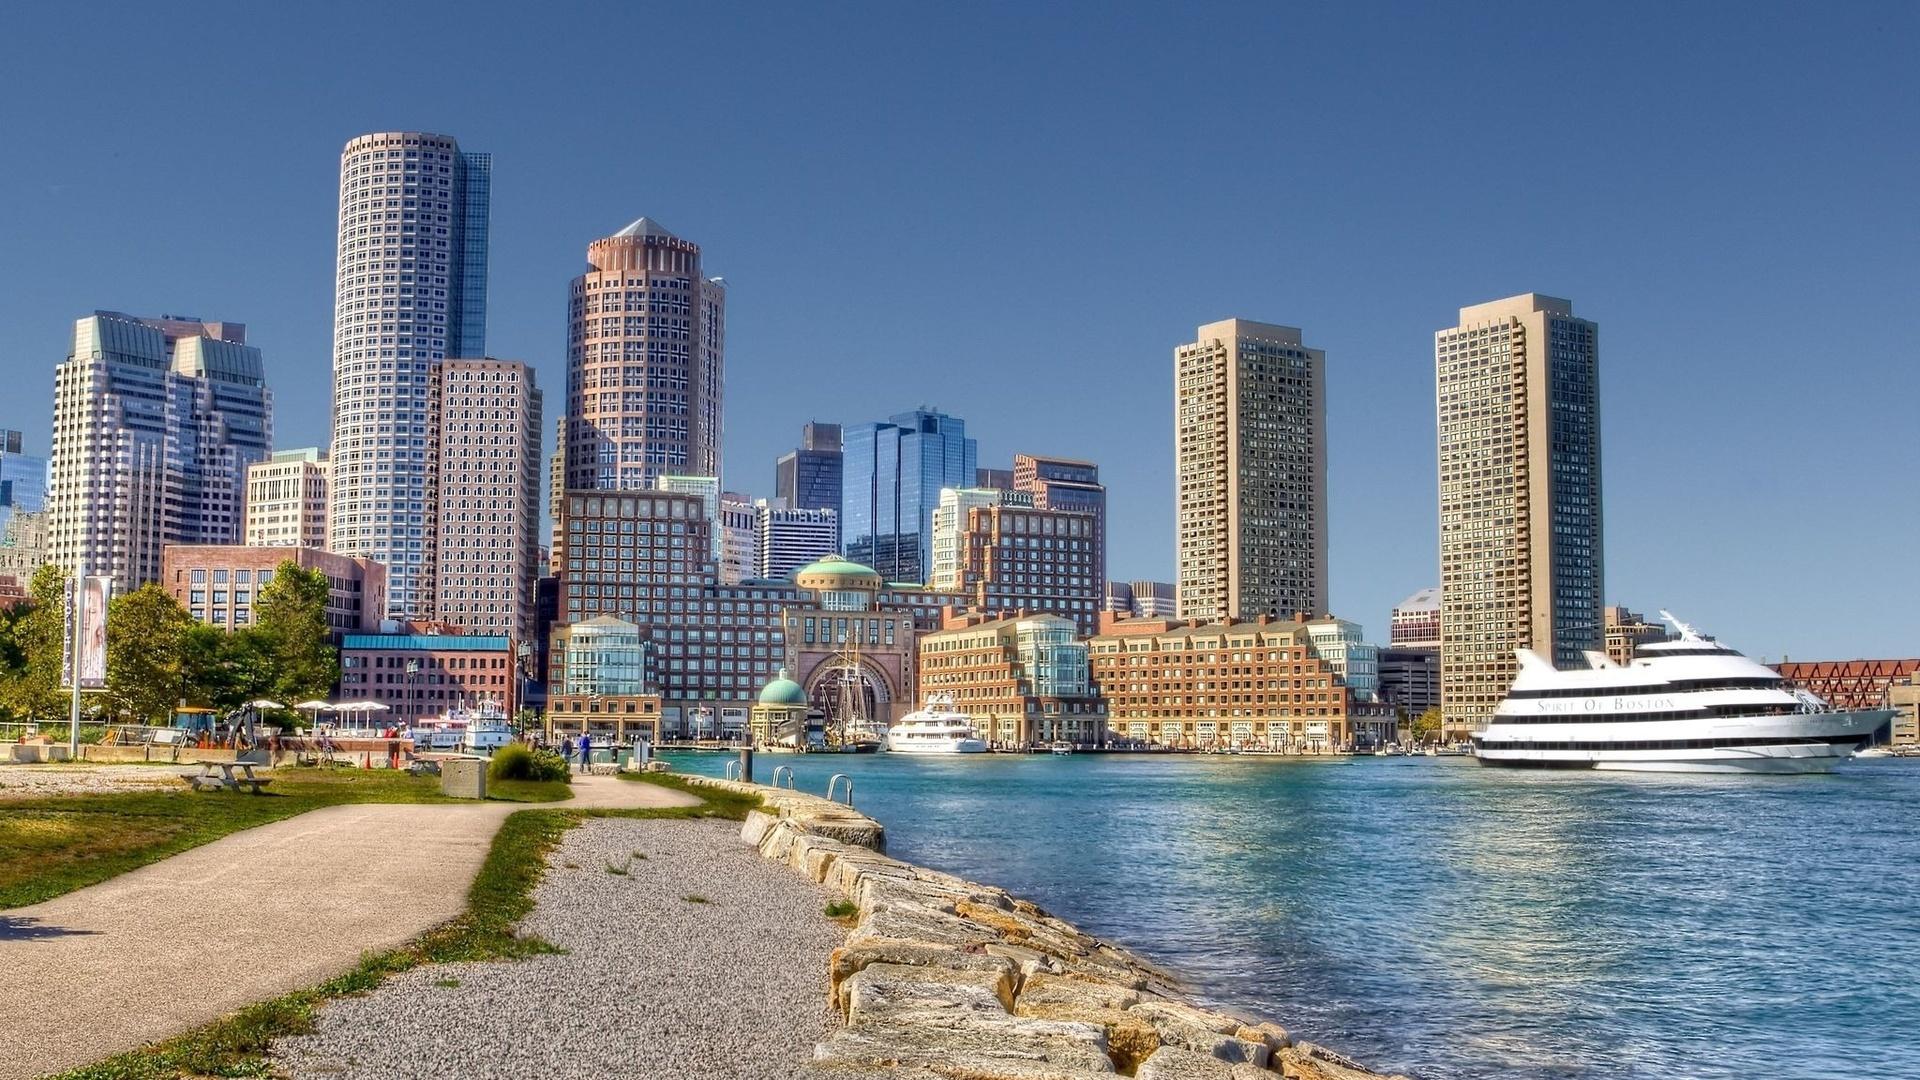 архитектура, Boston, набережная, бостон